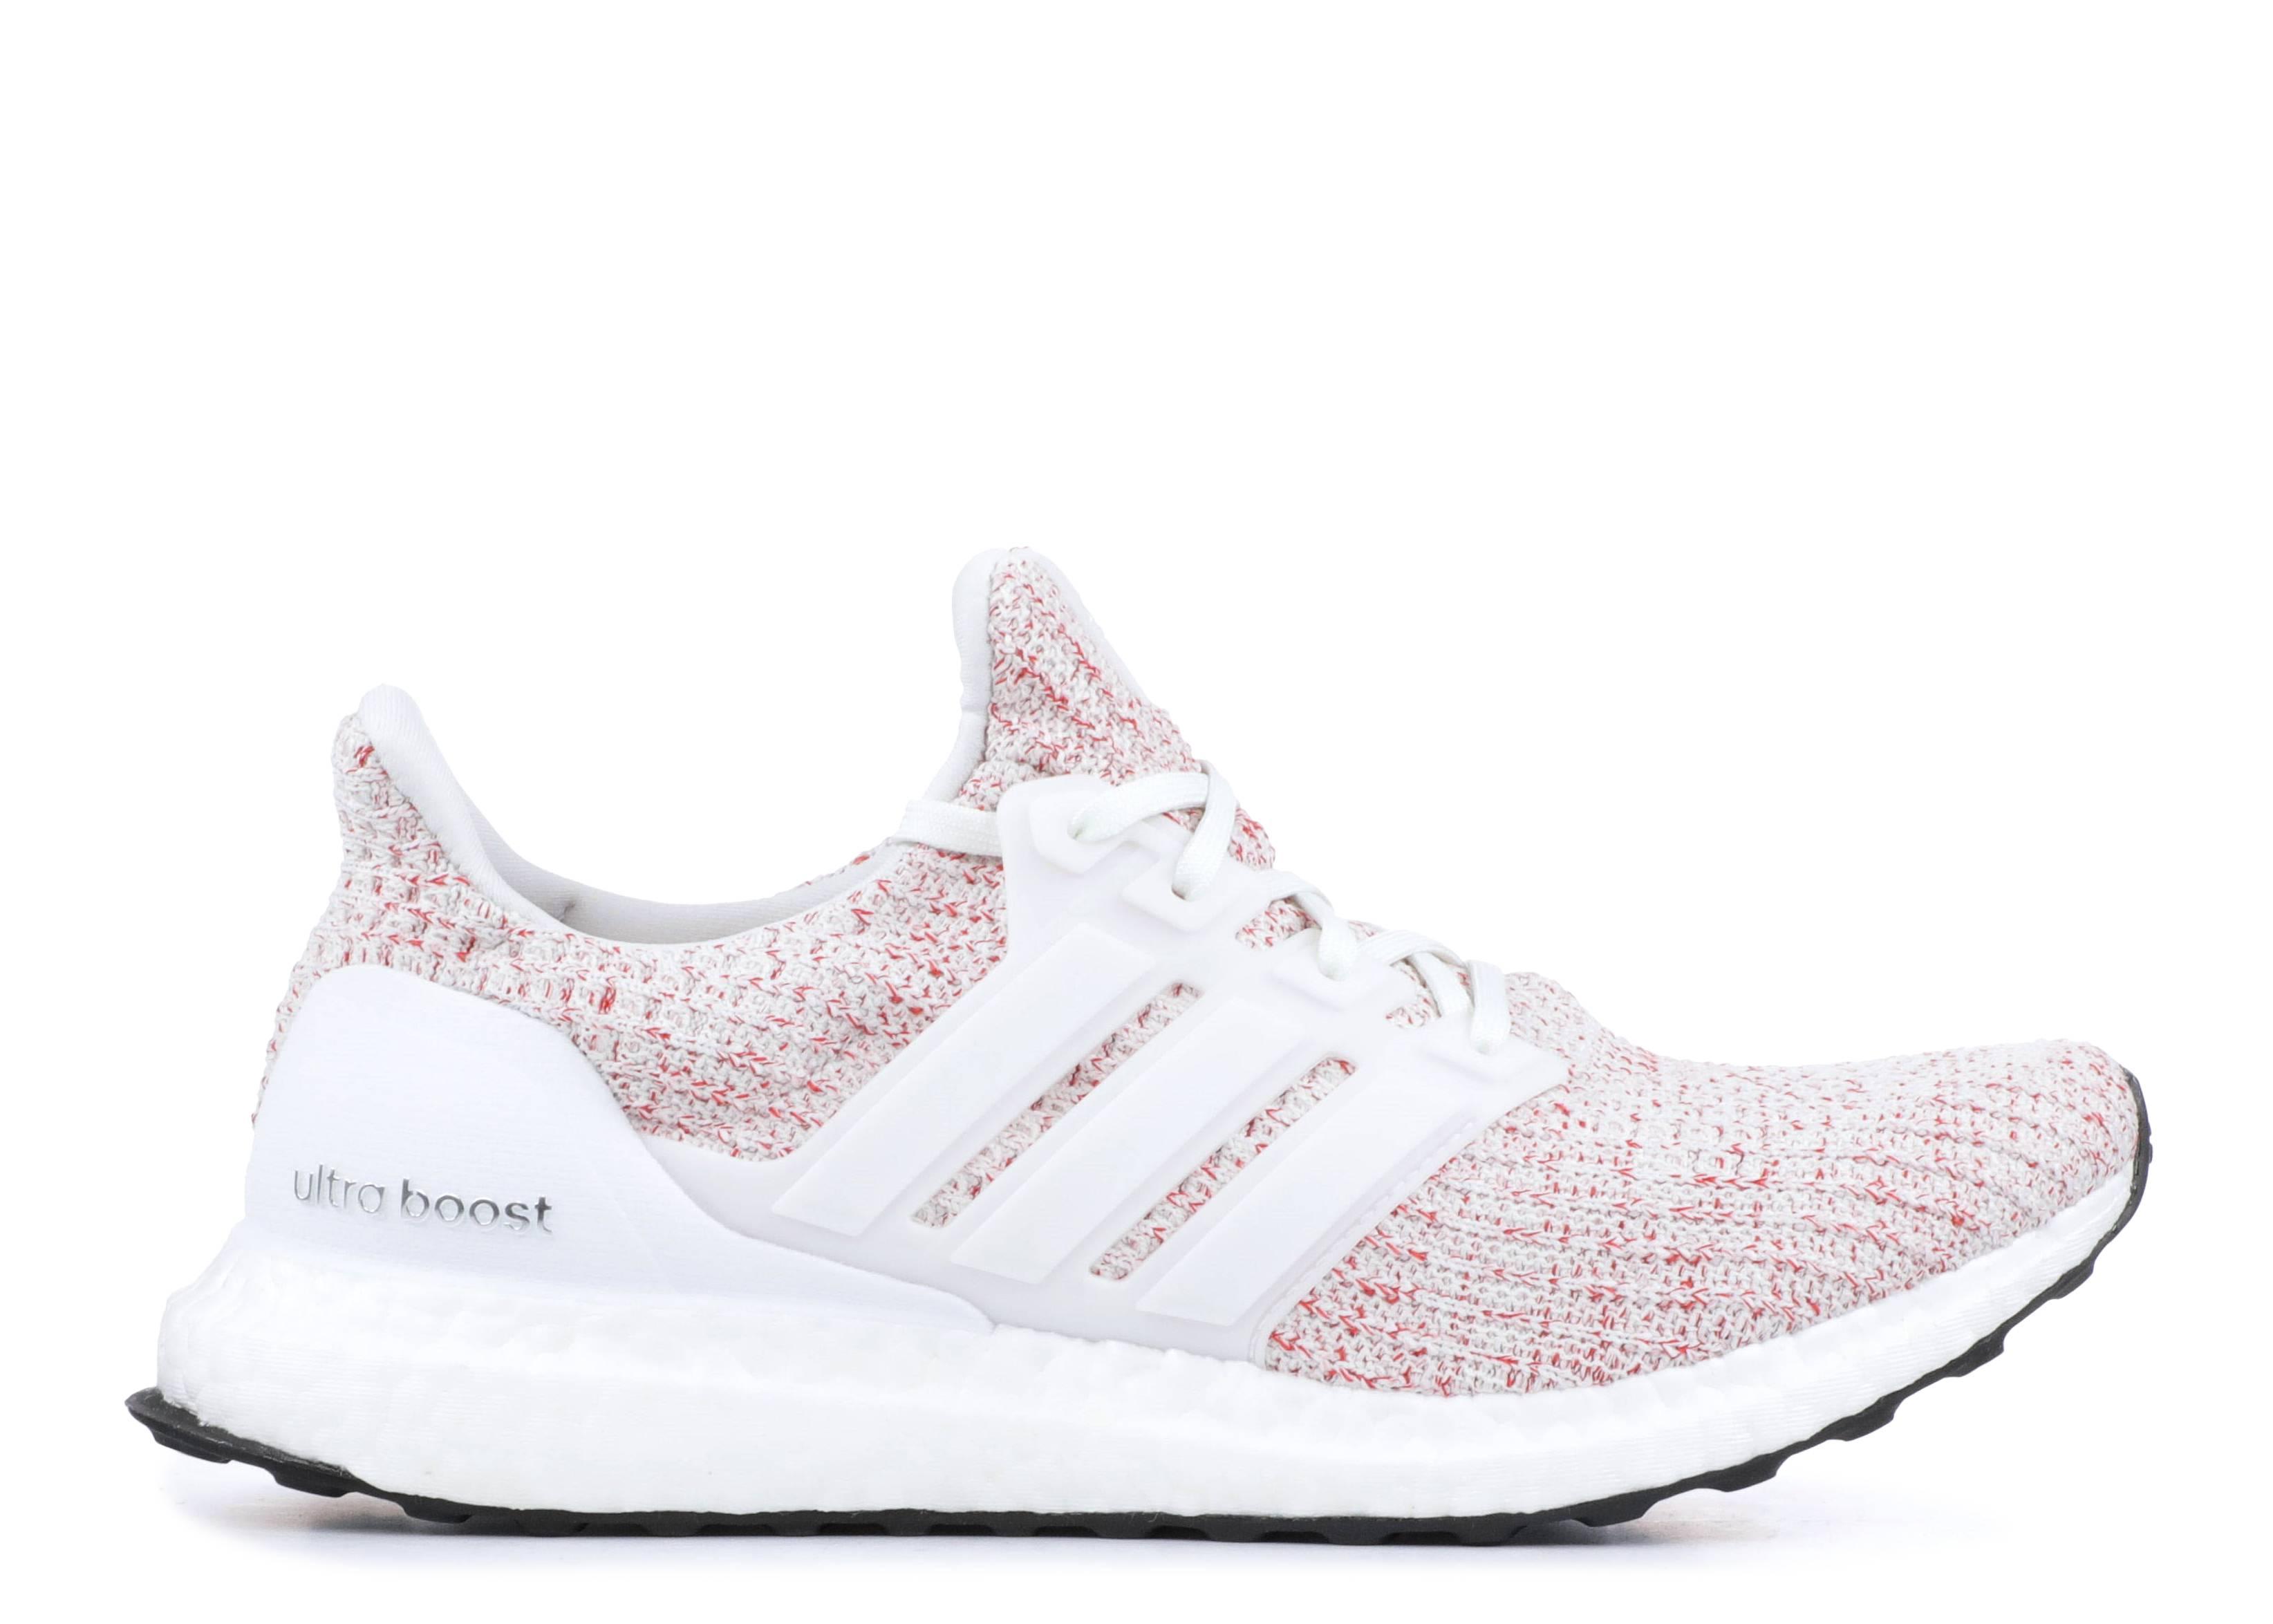 ef4377ae00a77 Ultra Boost - Adidas - bb6169 - pink white